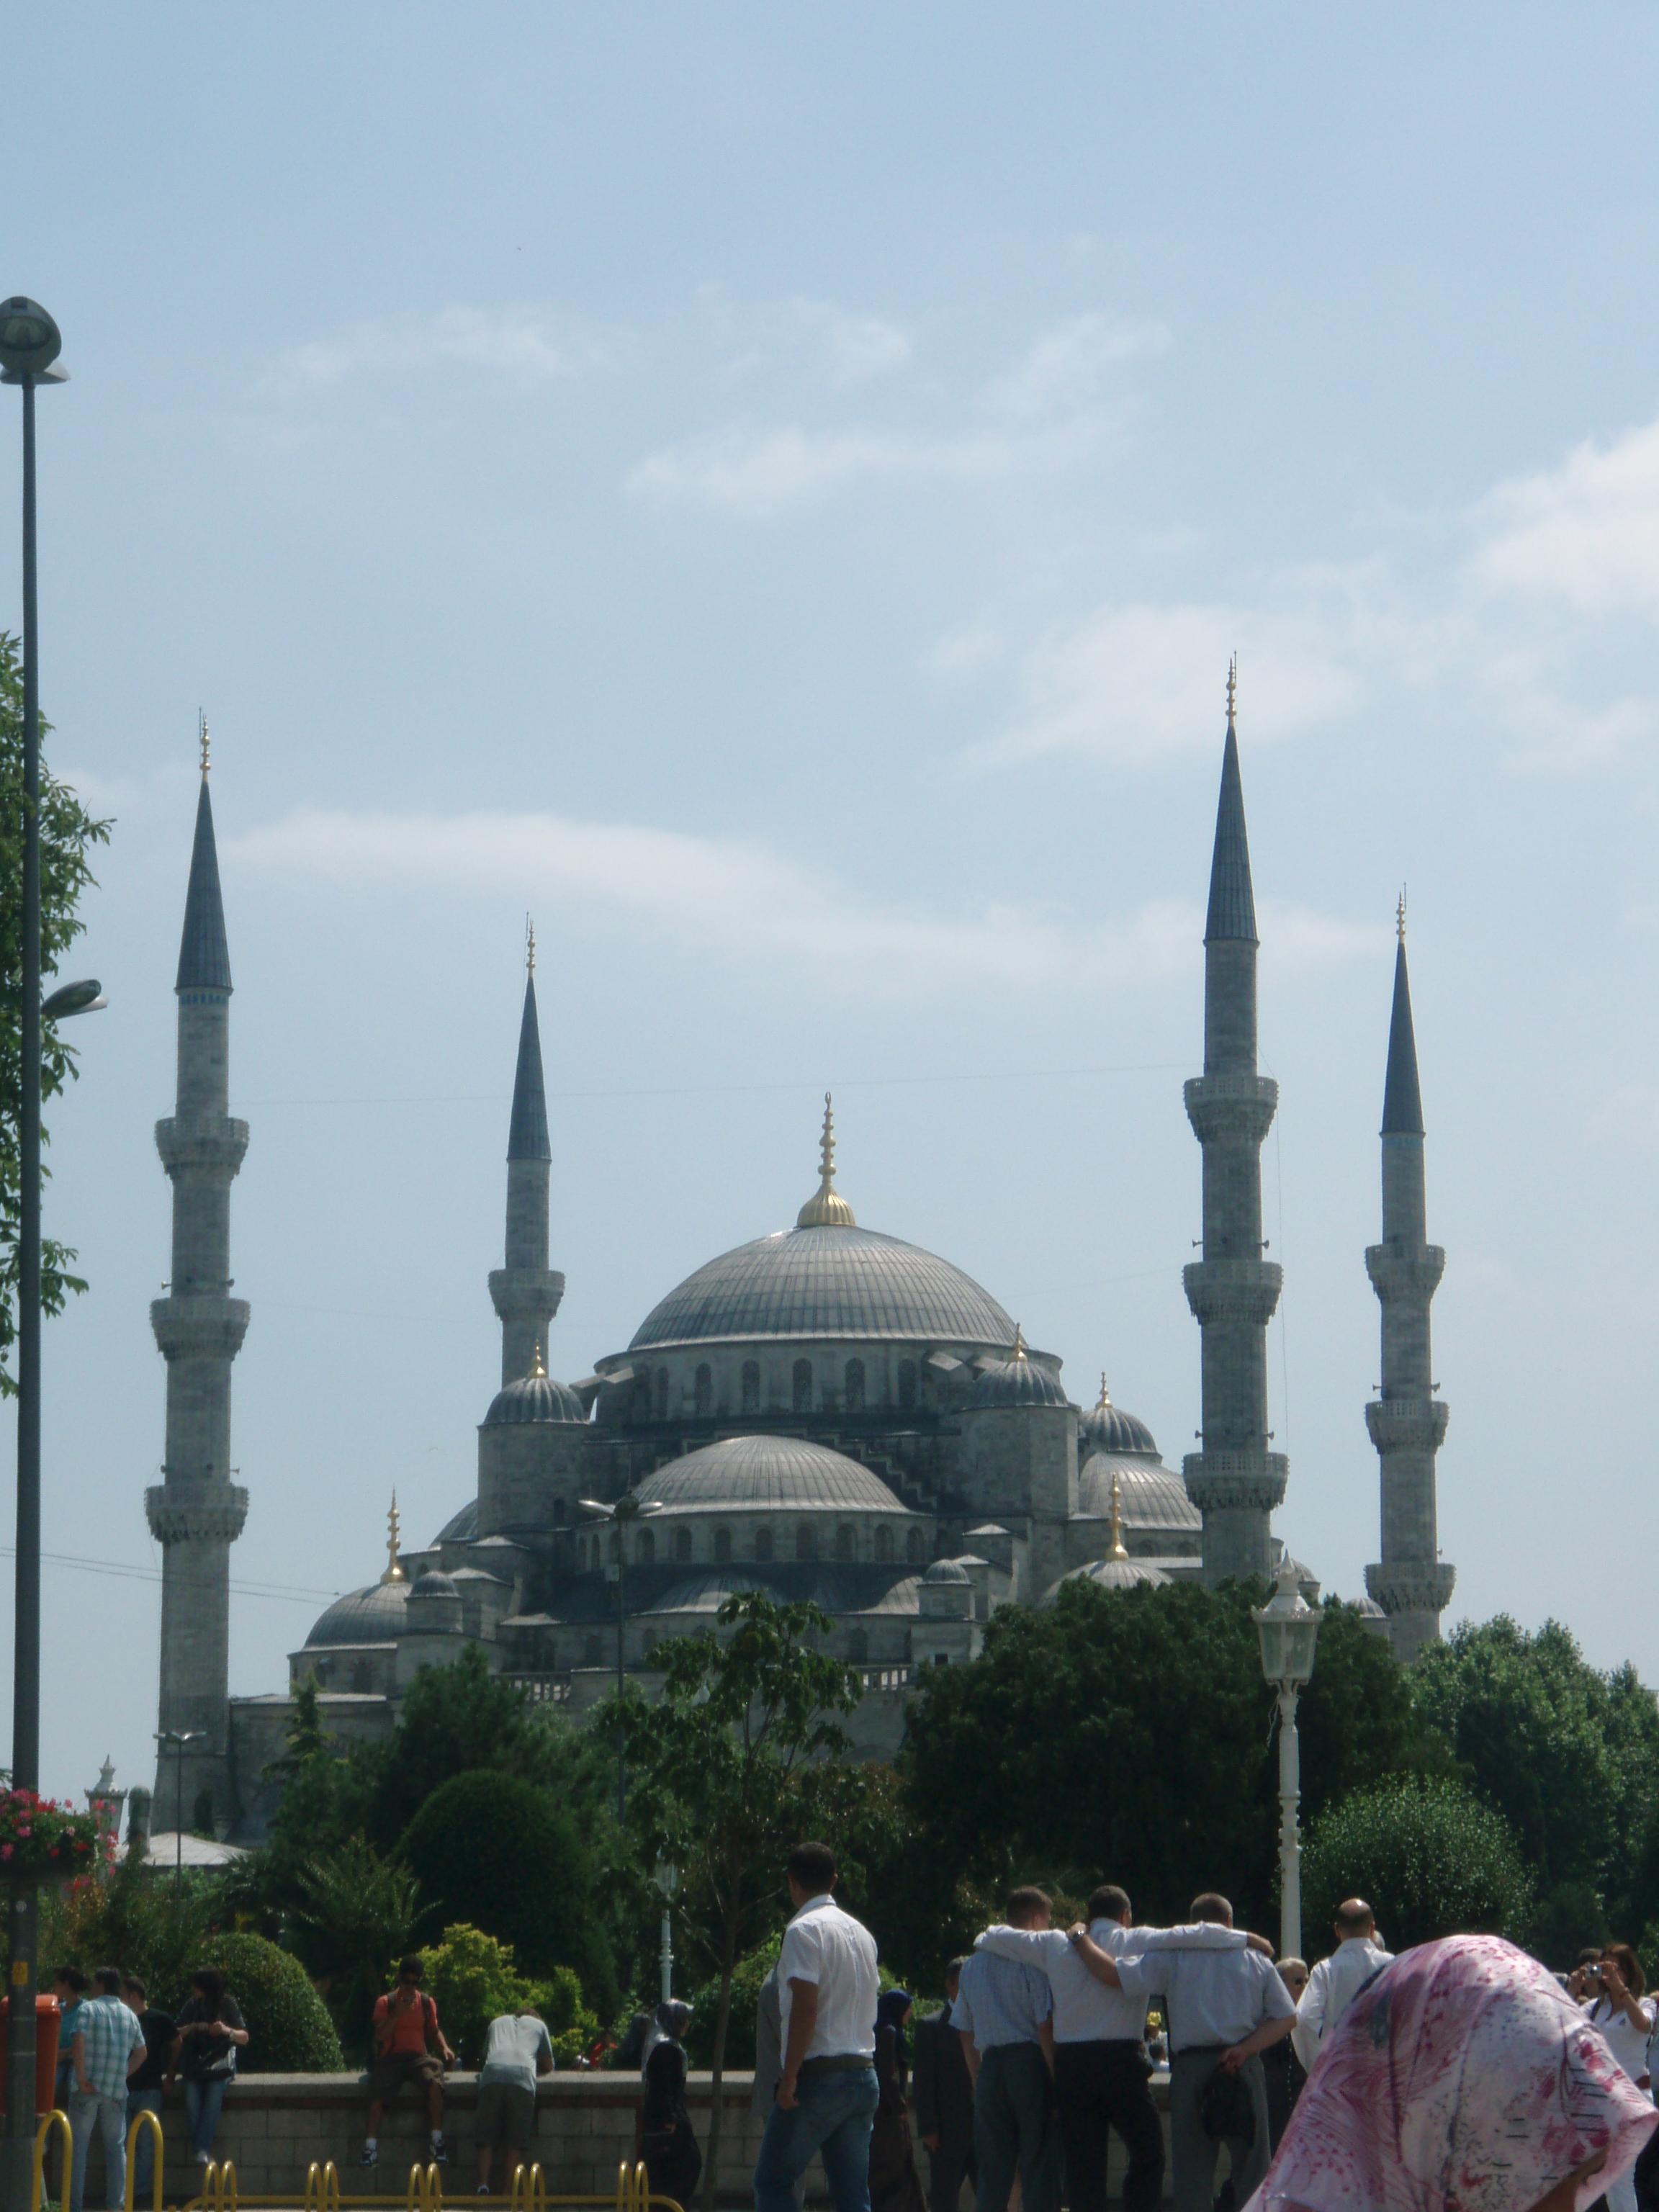 C A Turkey Istanbul File:Blue Mosque, Ista...